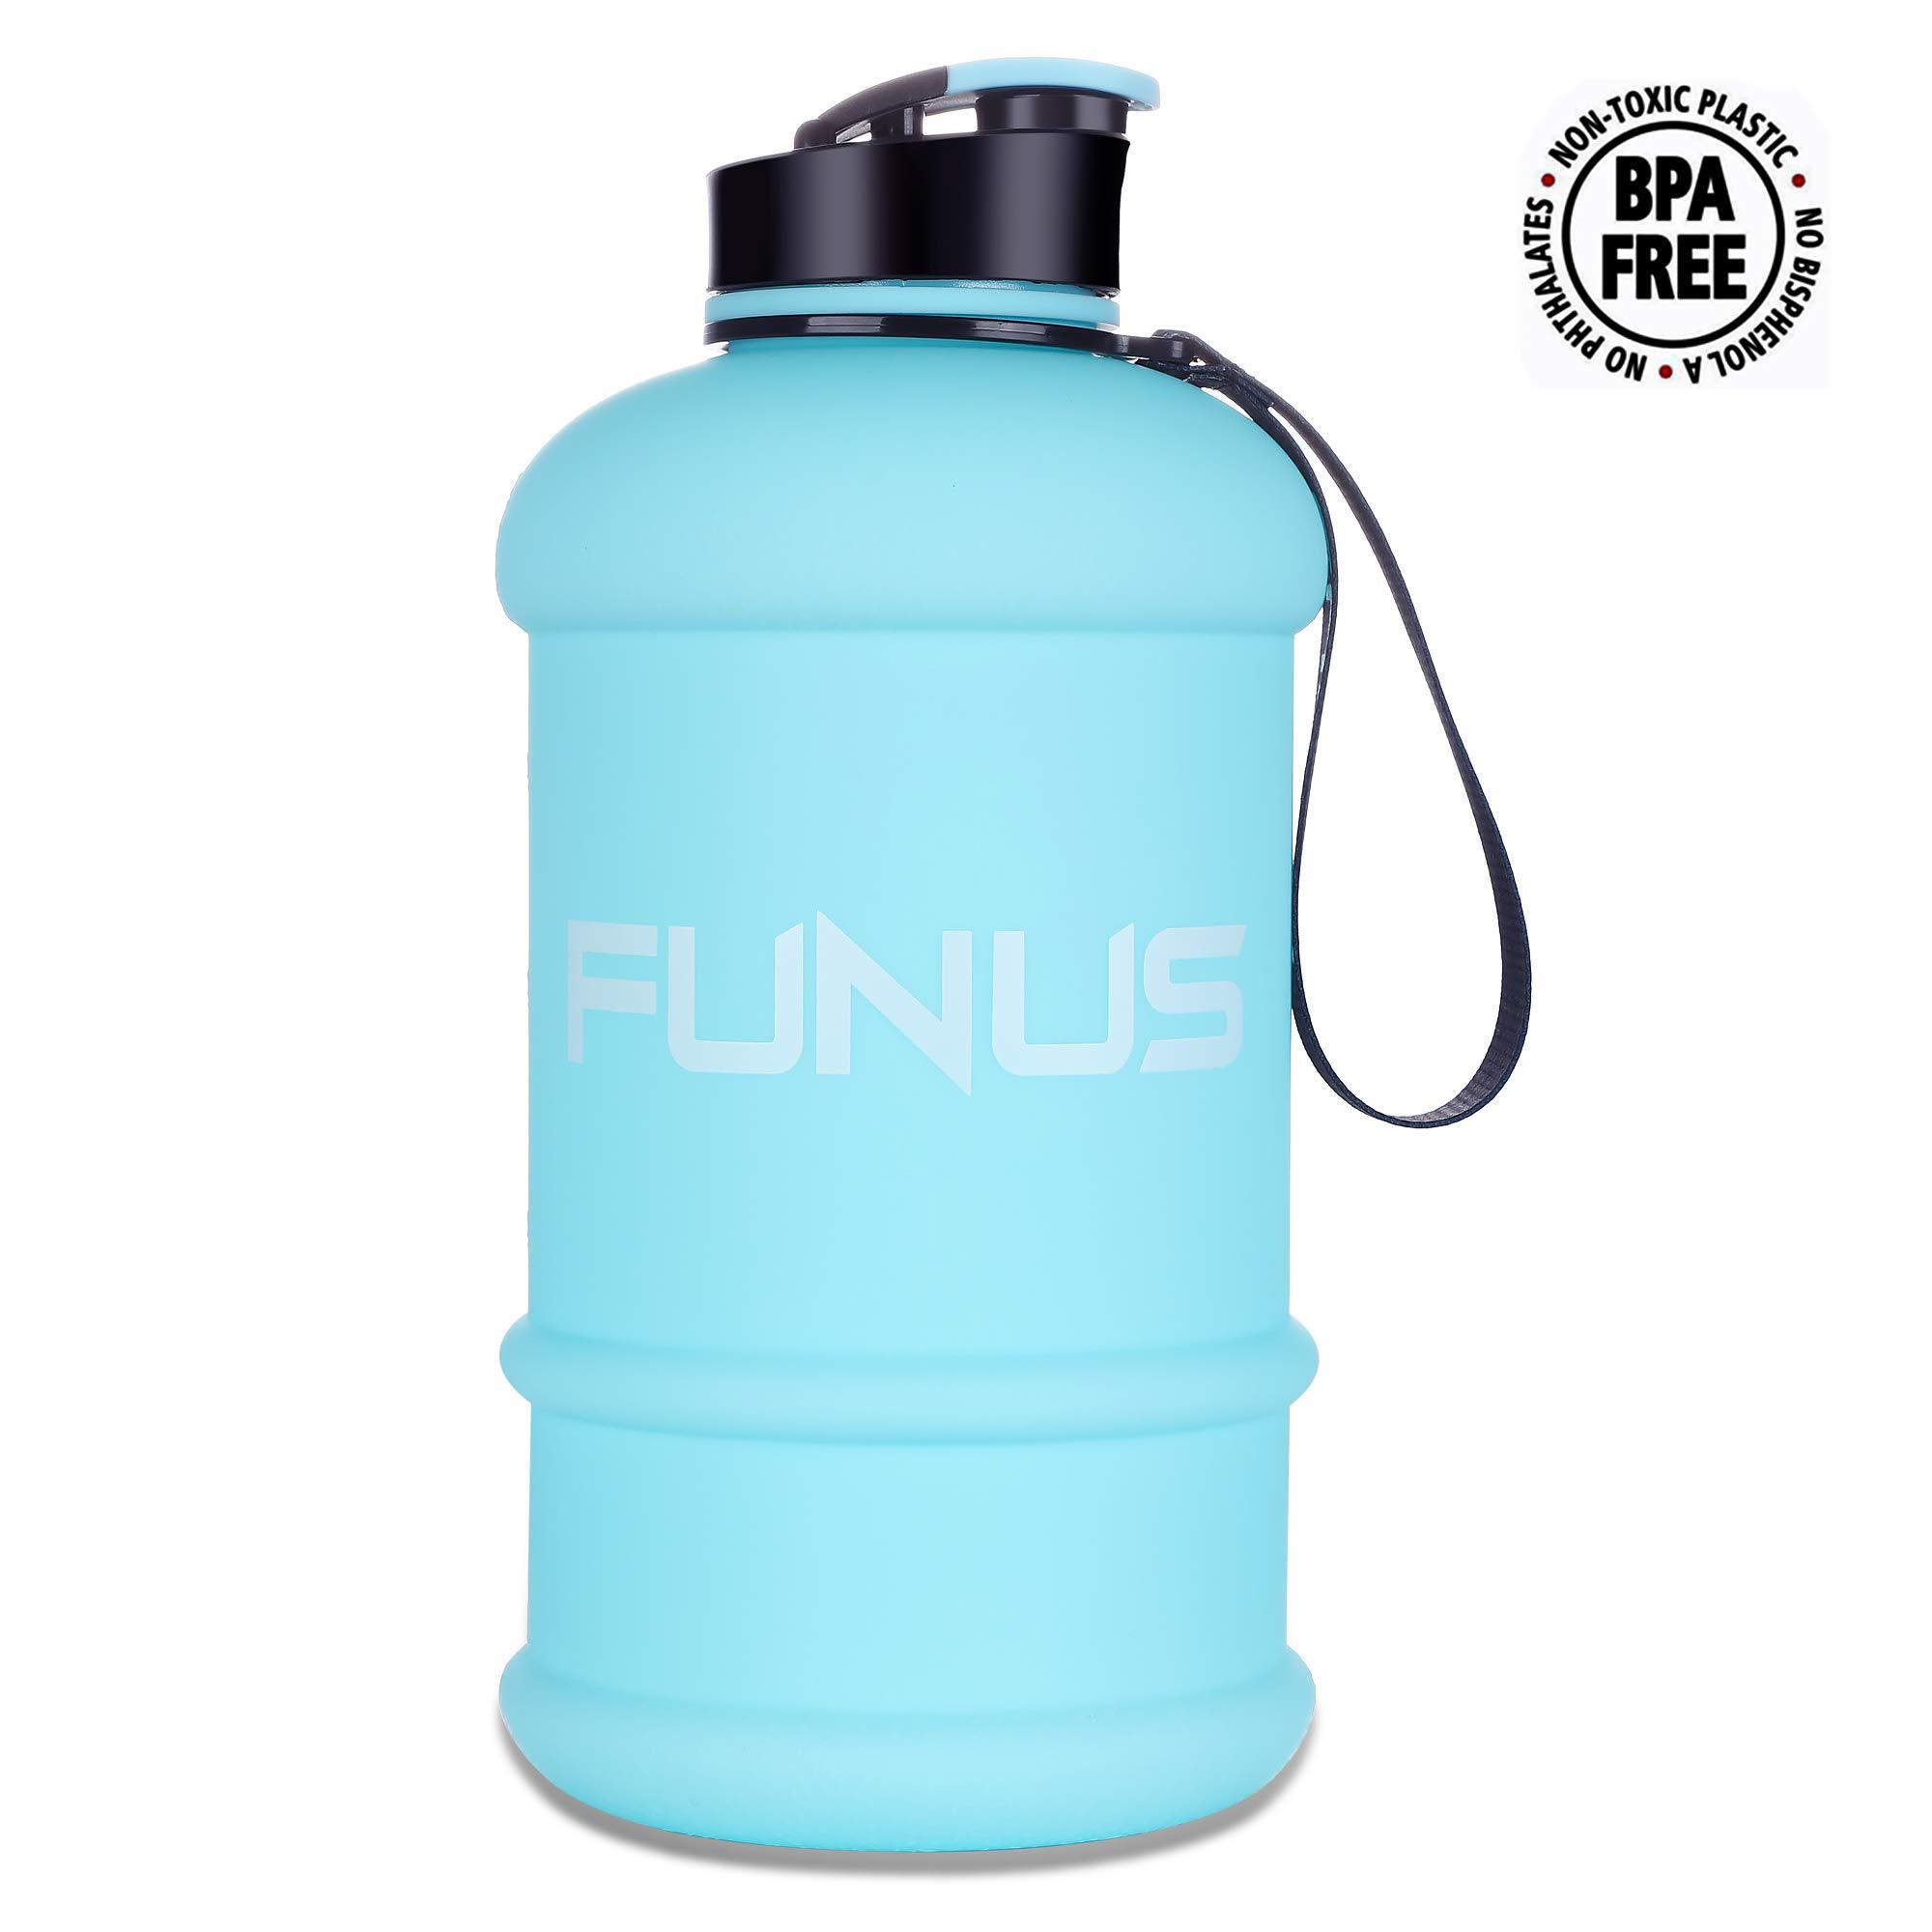 FUNUS Big Water Bottle 1.3L Large Water Bottle BPA Free Leak Proof Reusable Odorless Big Capacity Water Jug for Men Women Fitness Gym Outdoor Climbing Gym Water Bottle (1.3L Matte SkyBlue) by FUNUS